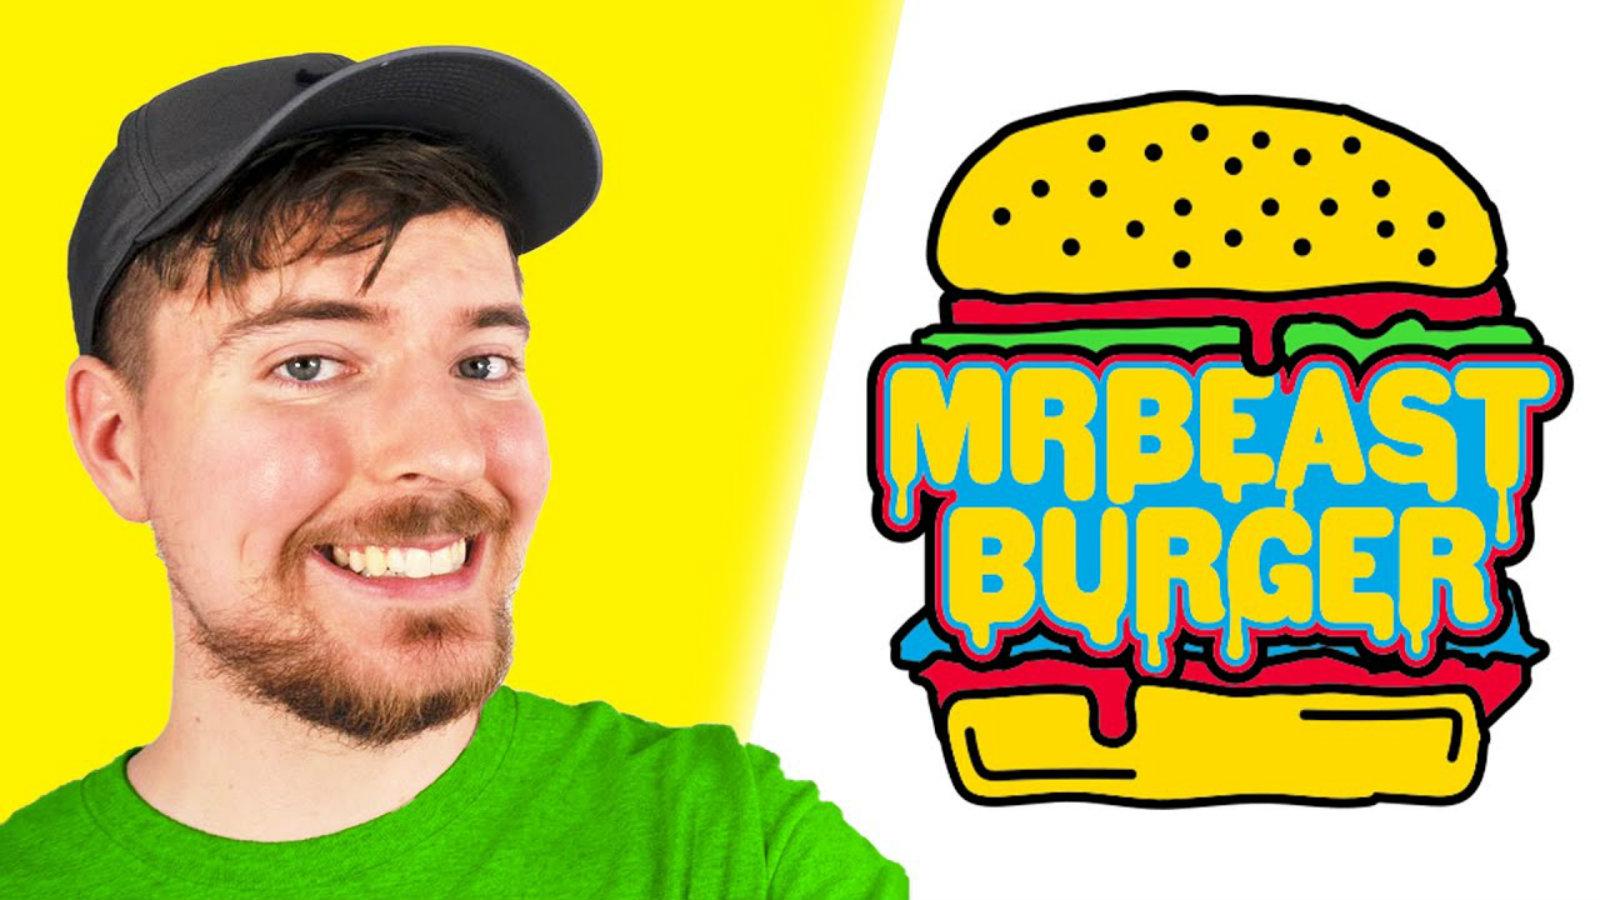 Mr Beast Burger logo